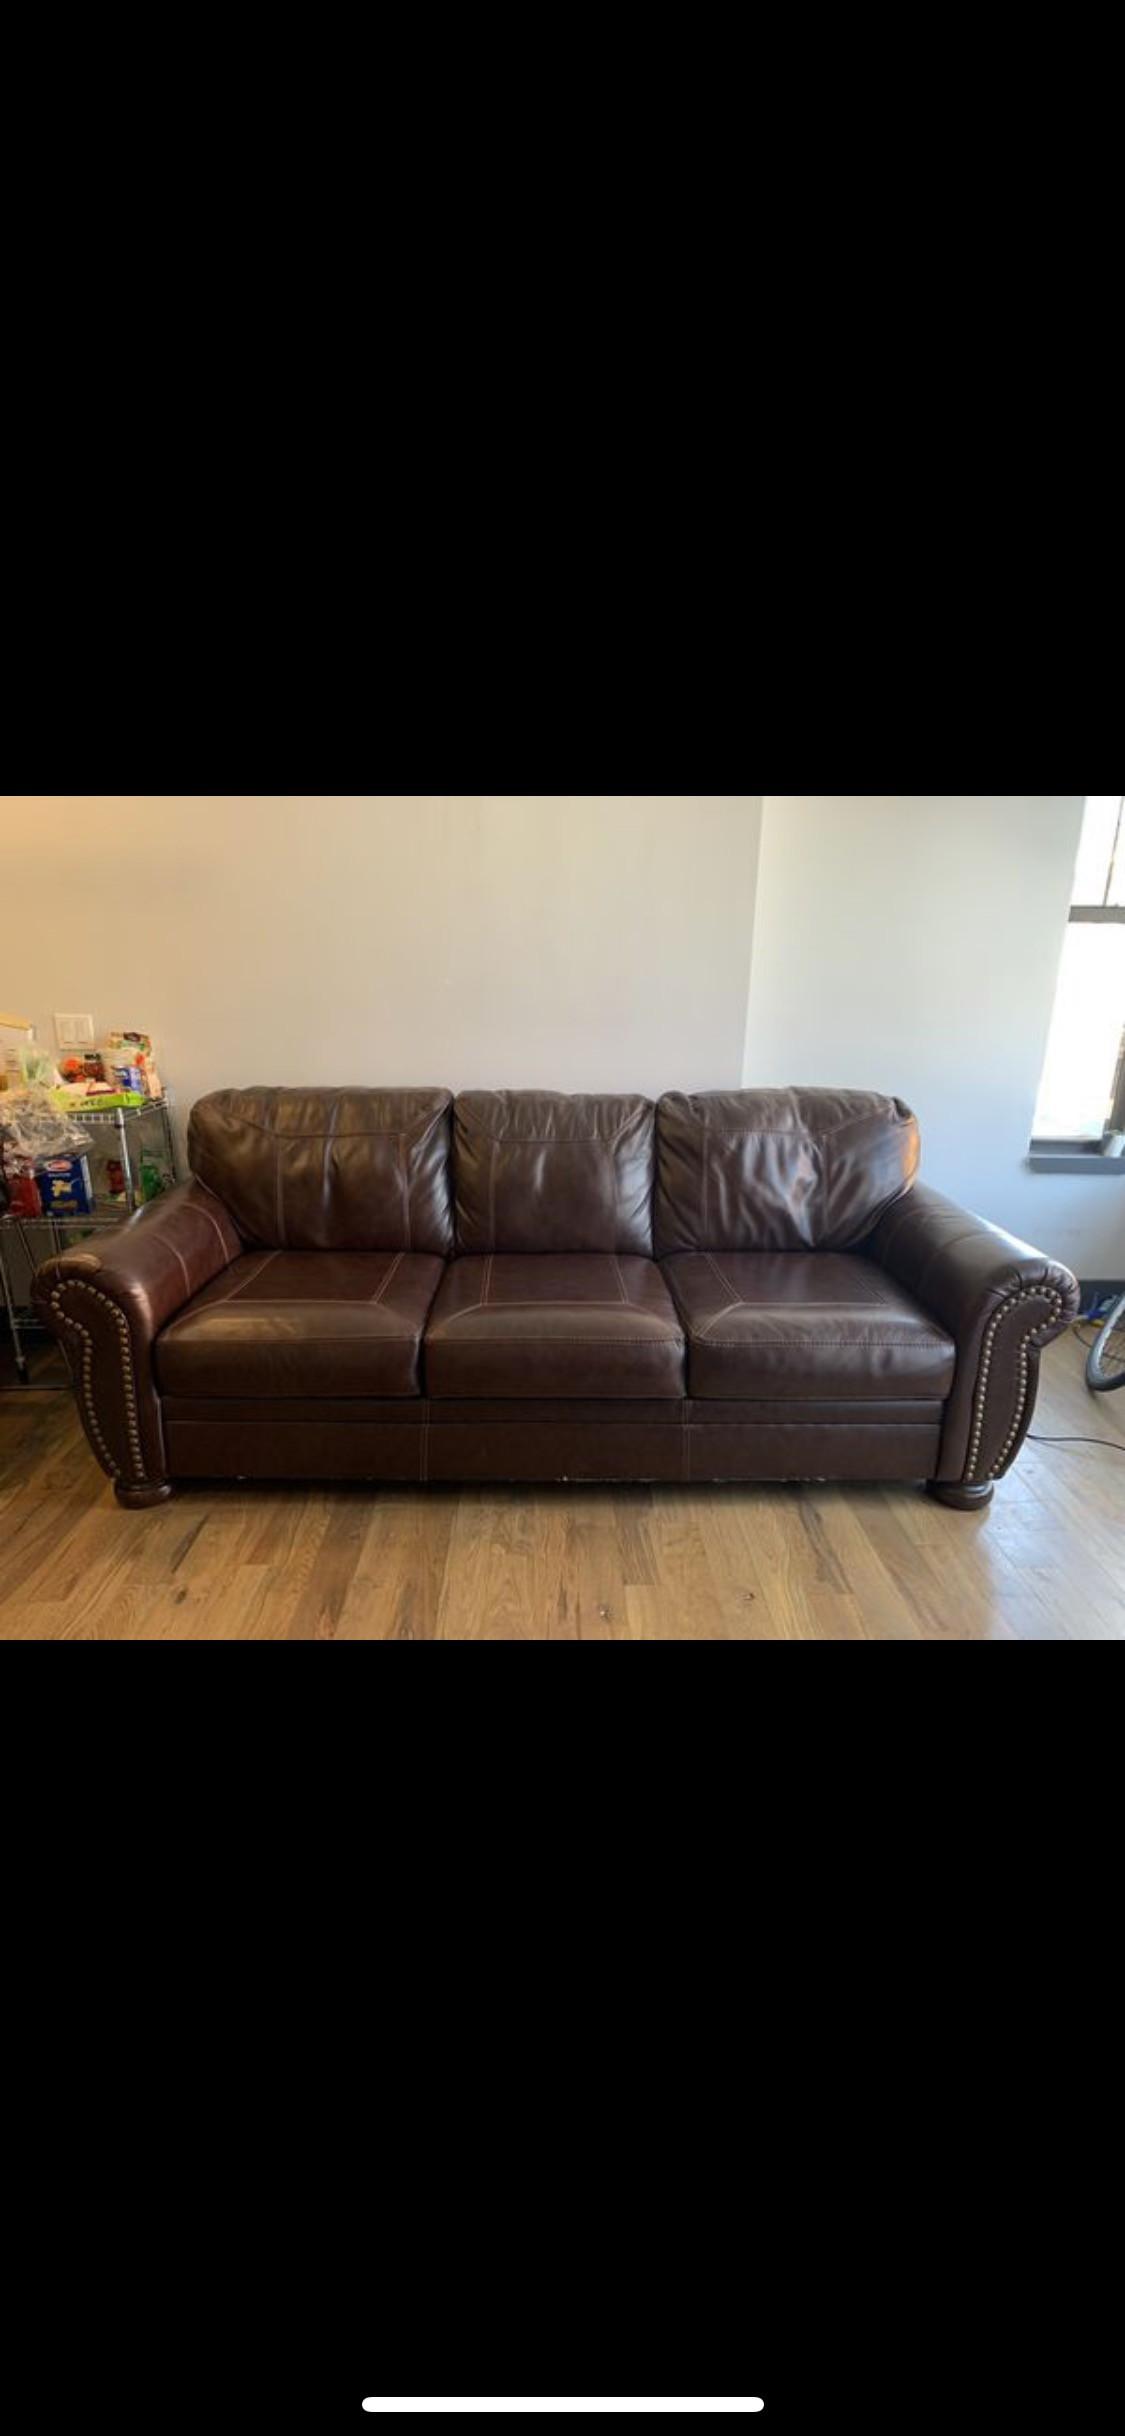 Ashley Brown Leather Sofa w/ Nailhead Trim - AptDeco